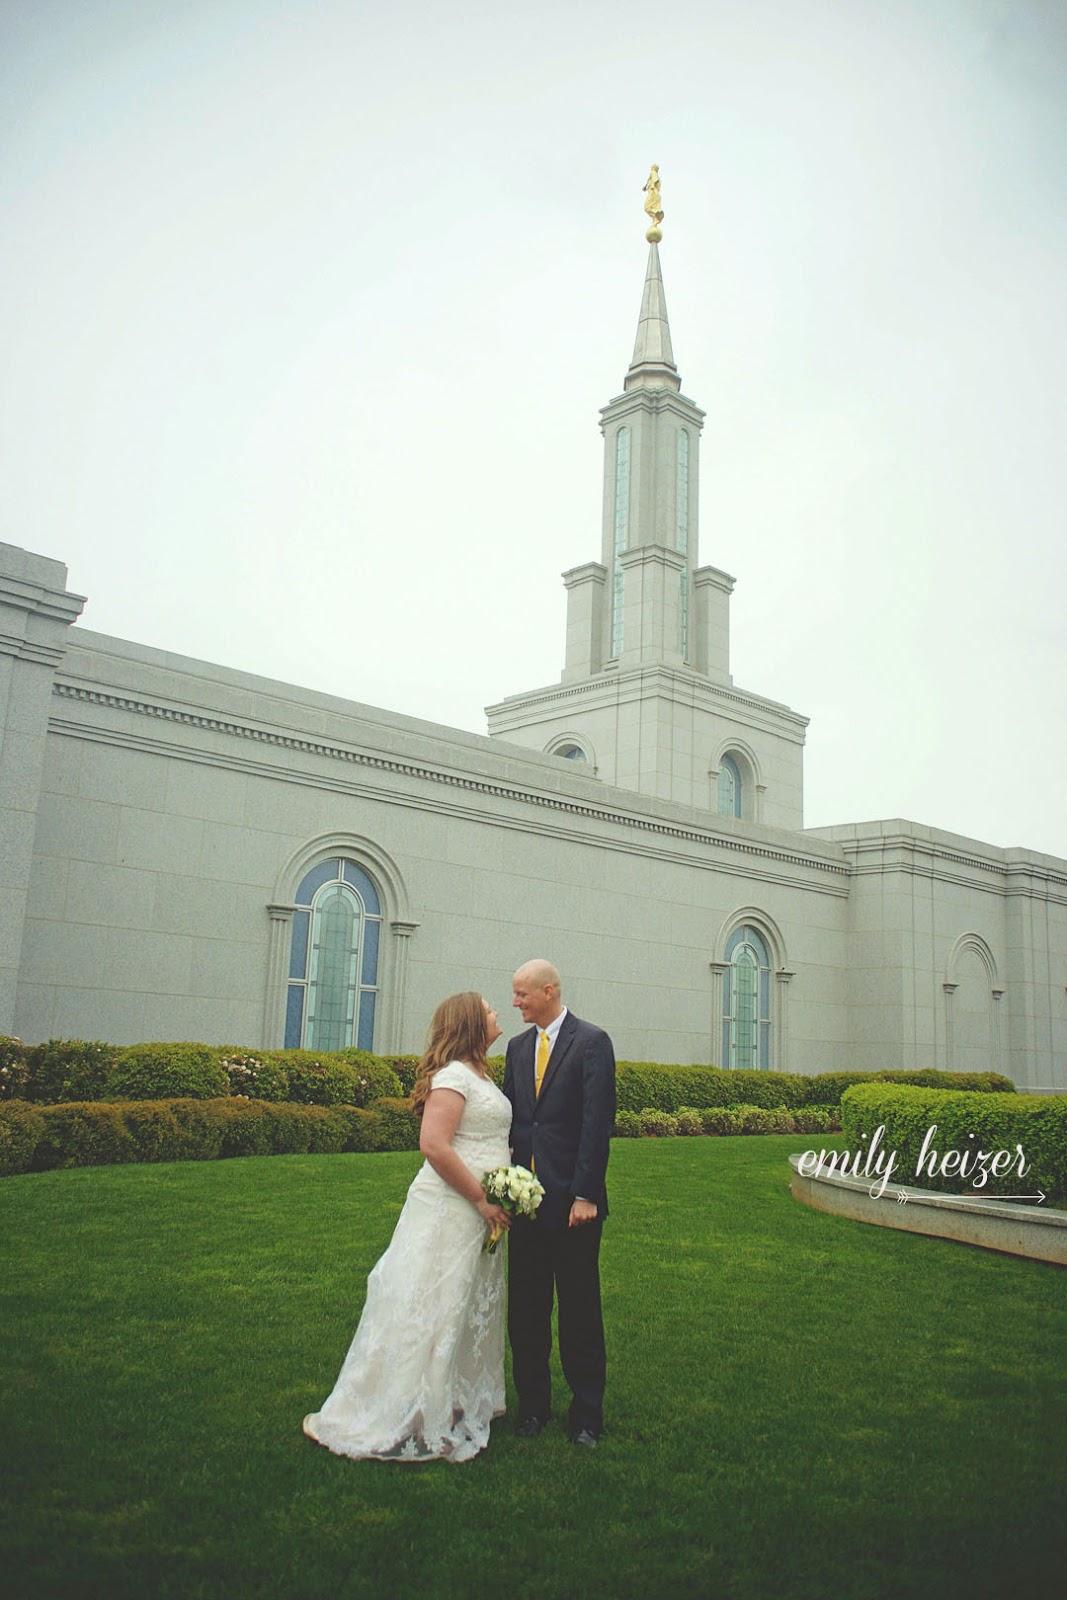 Sacramento Wedding Dress 71 Perfect Images by Emily Heizer